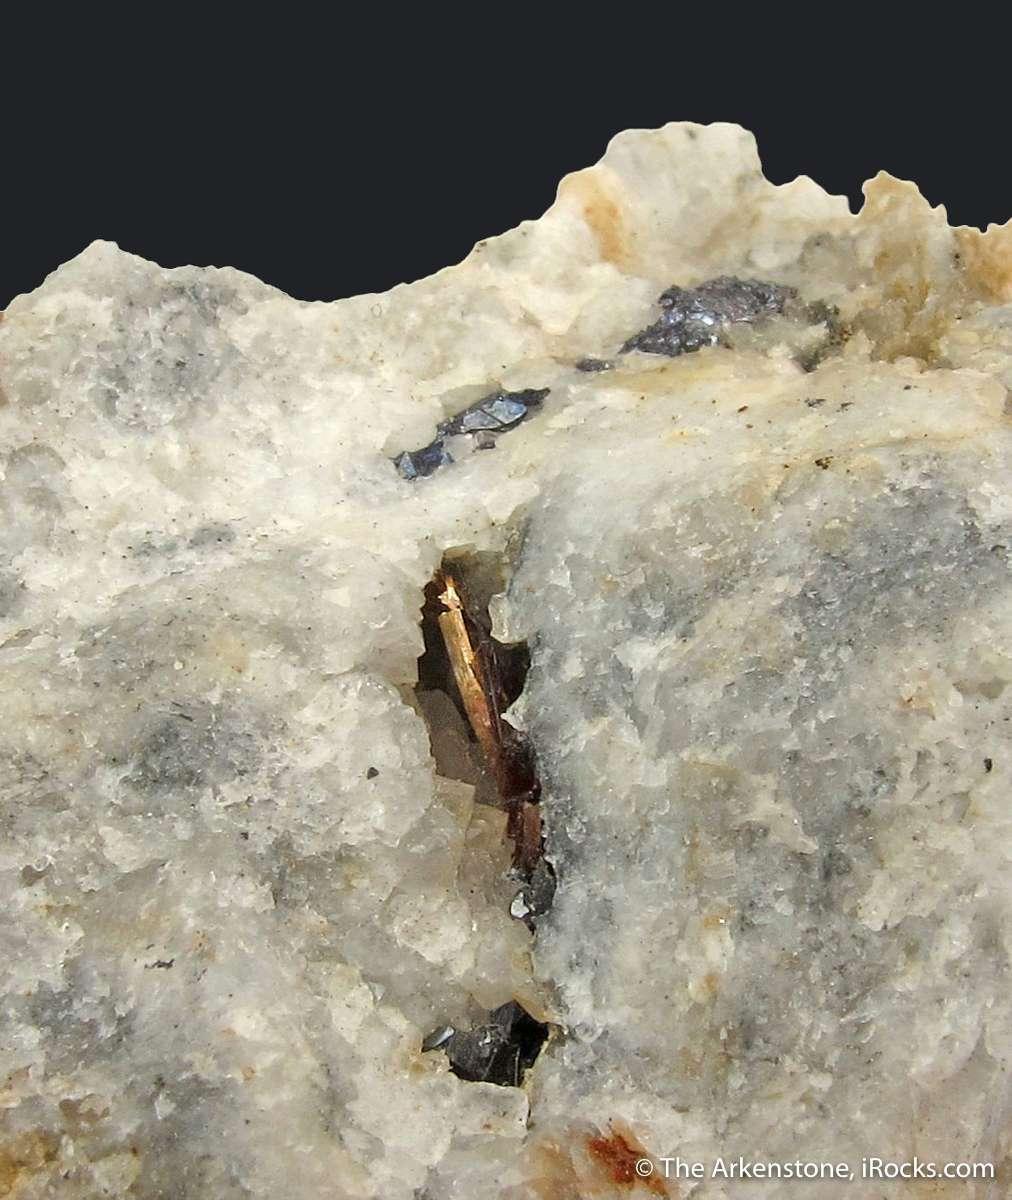 This times I feel privileged handle treasure Pyrostilpnite rare